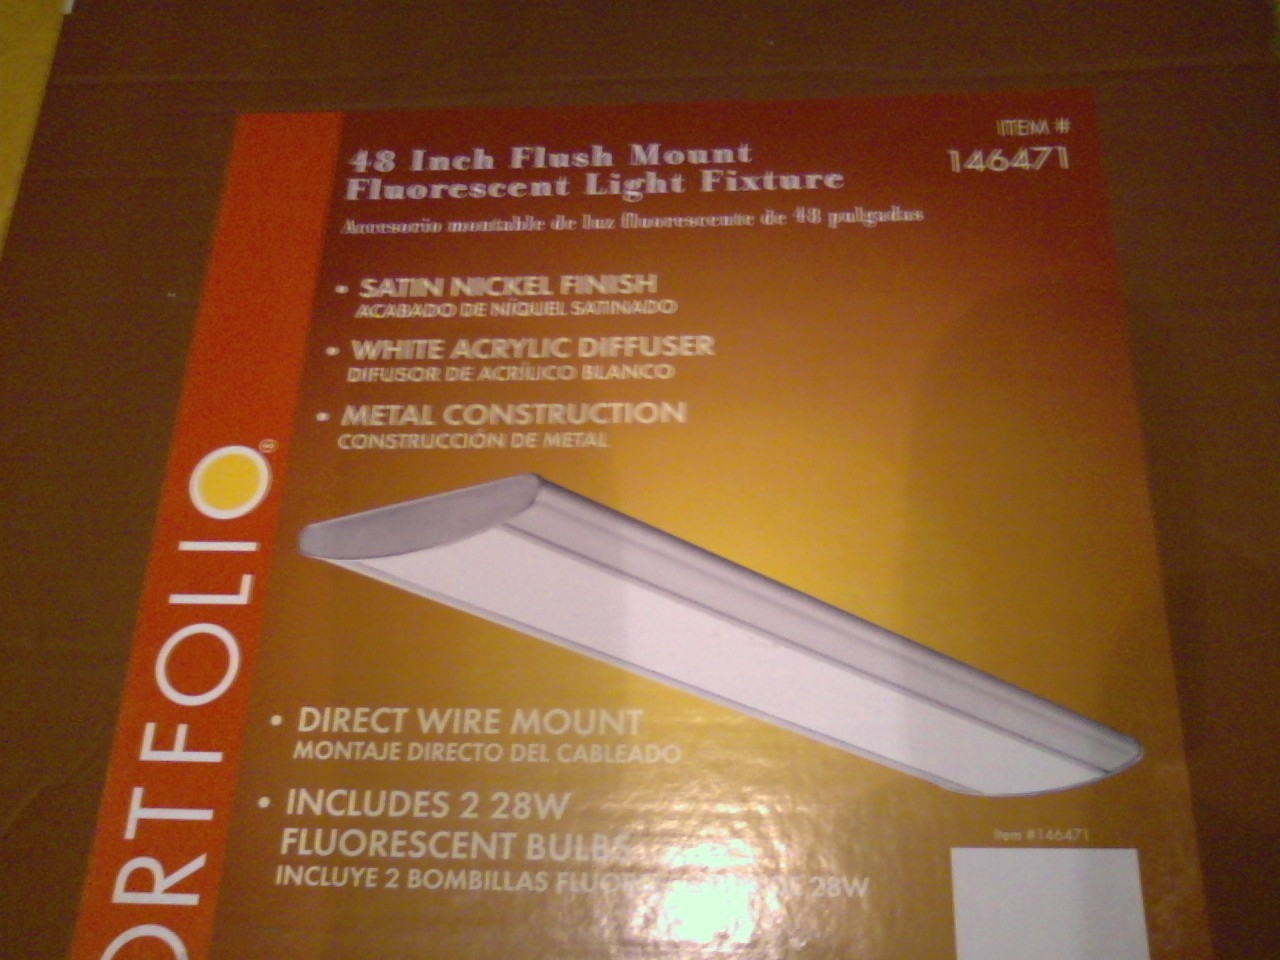 Purchased Light